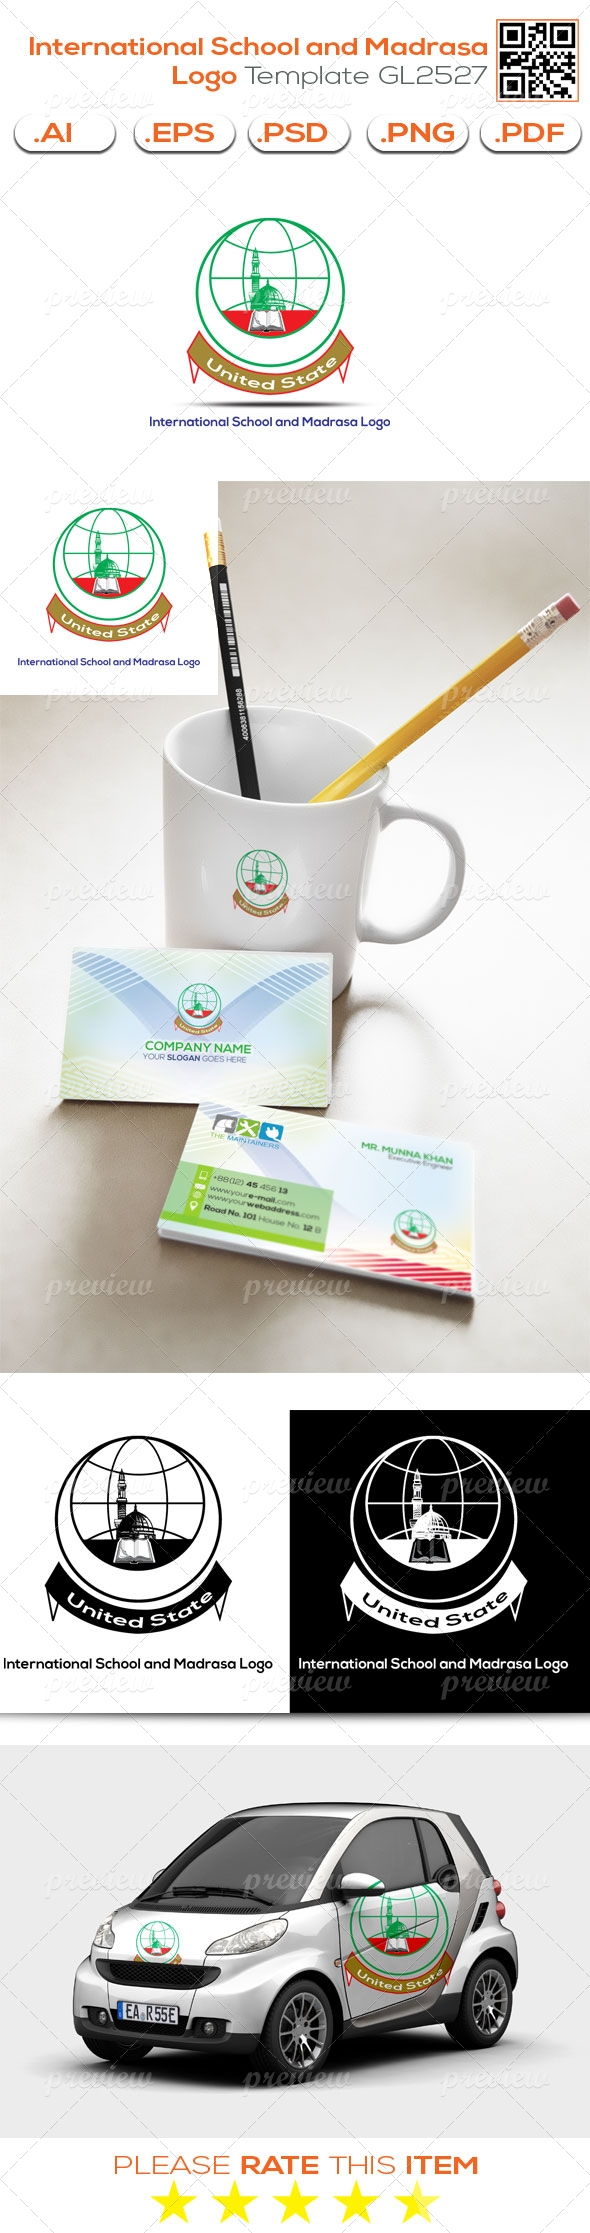 International School and Madrasa Logo Template GL2527